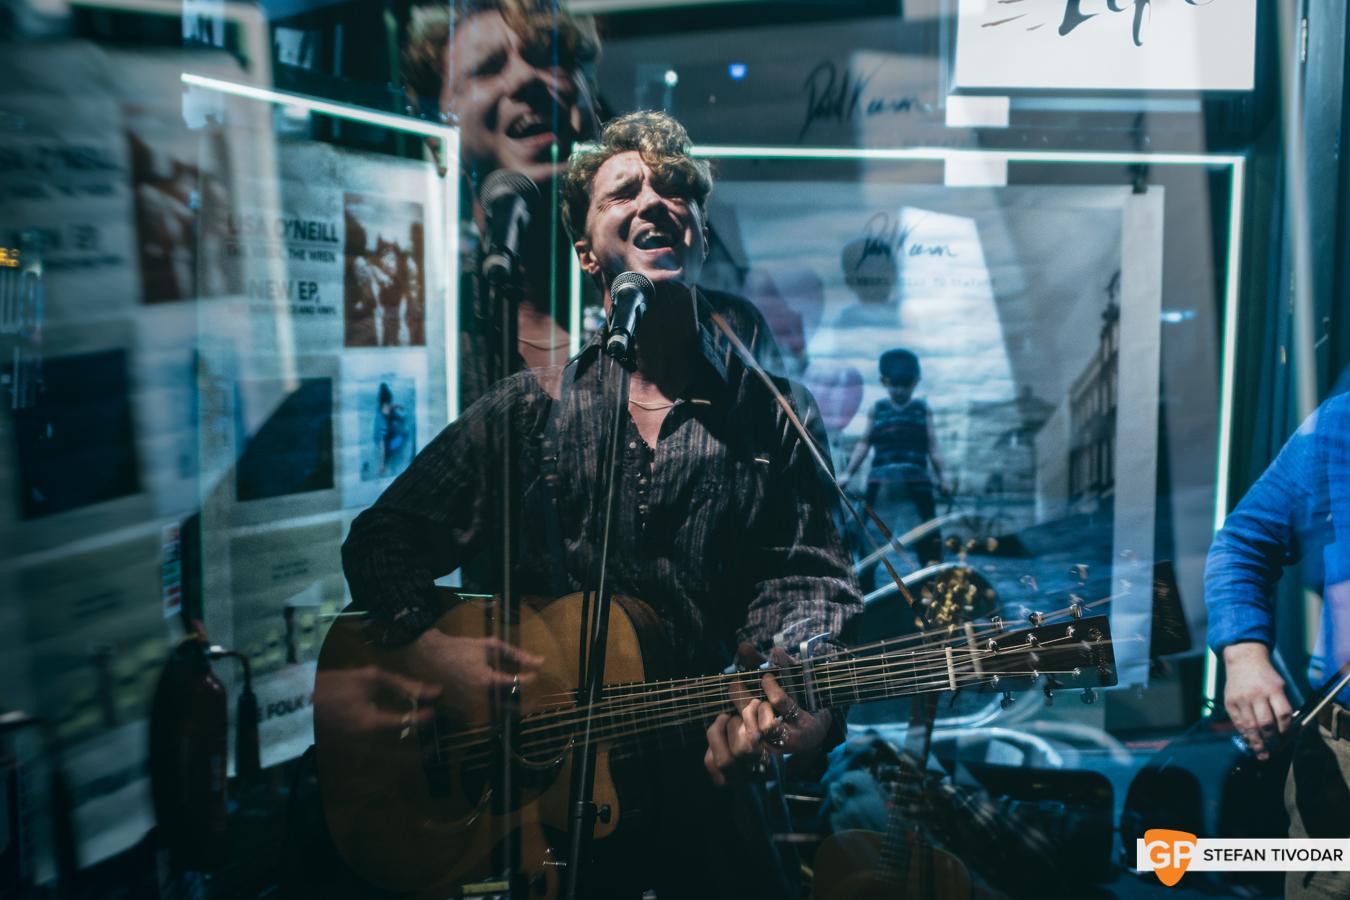 David Keenan Album Launch Tower Records Dublin 2020 Tivodar 3